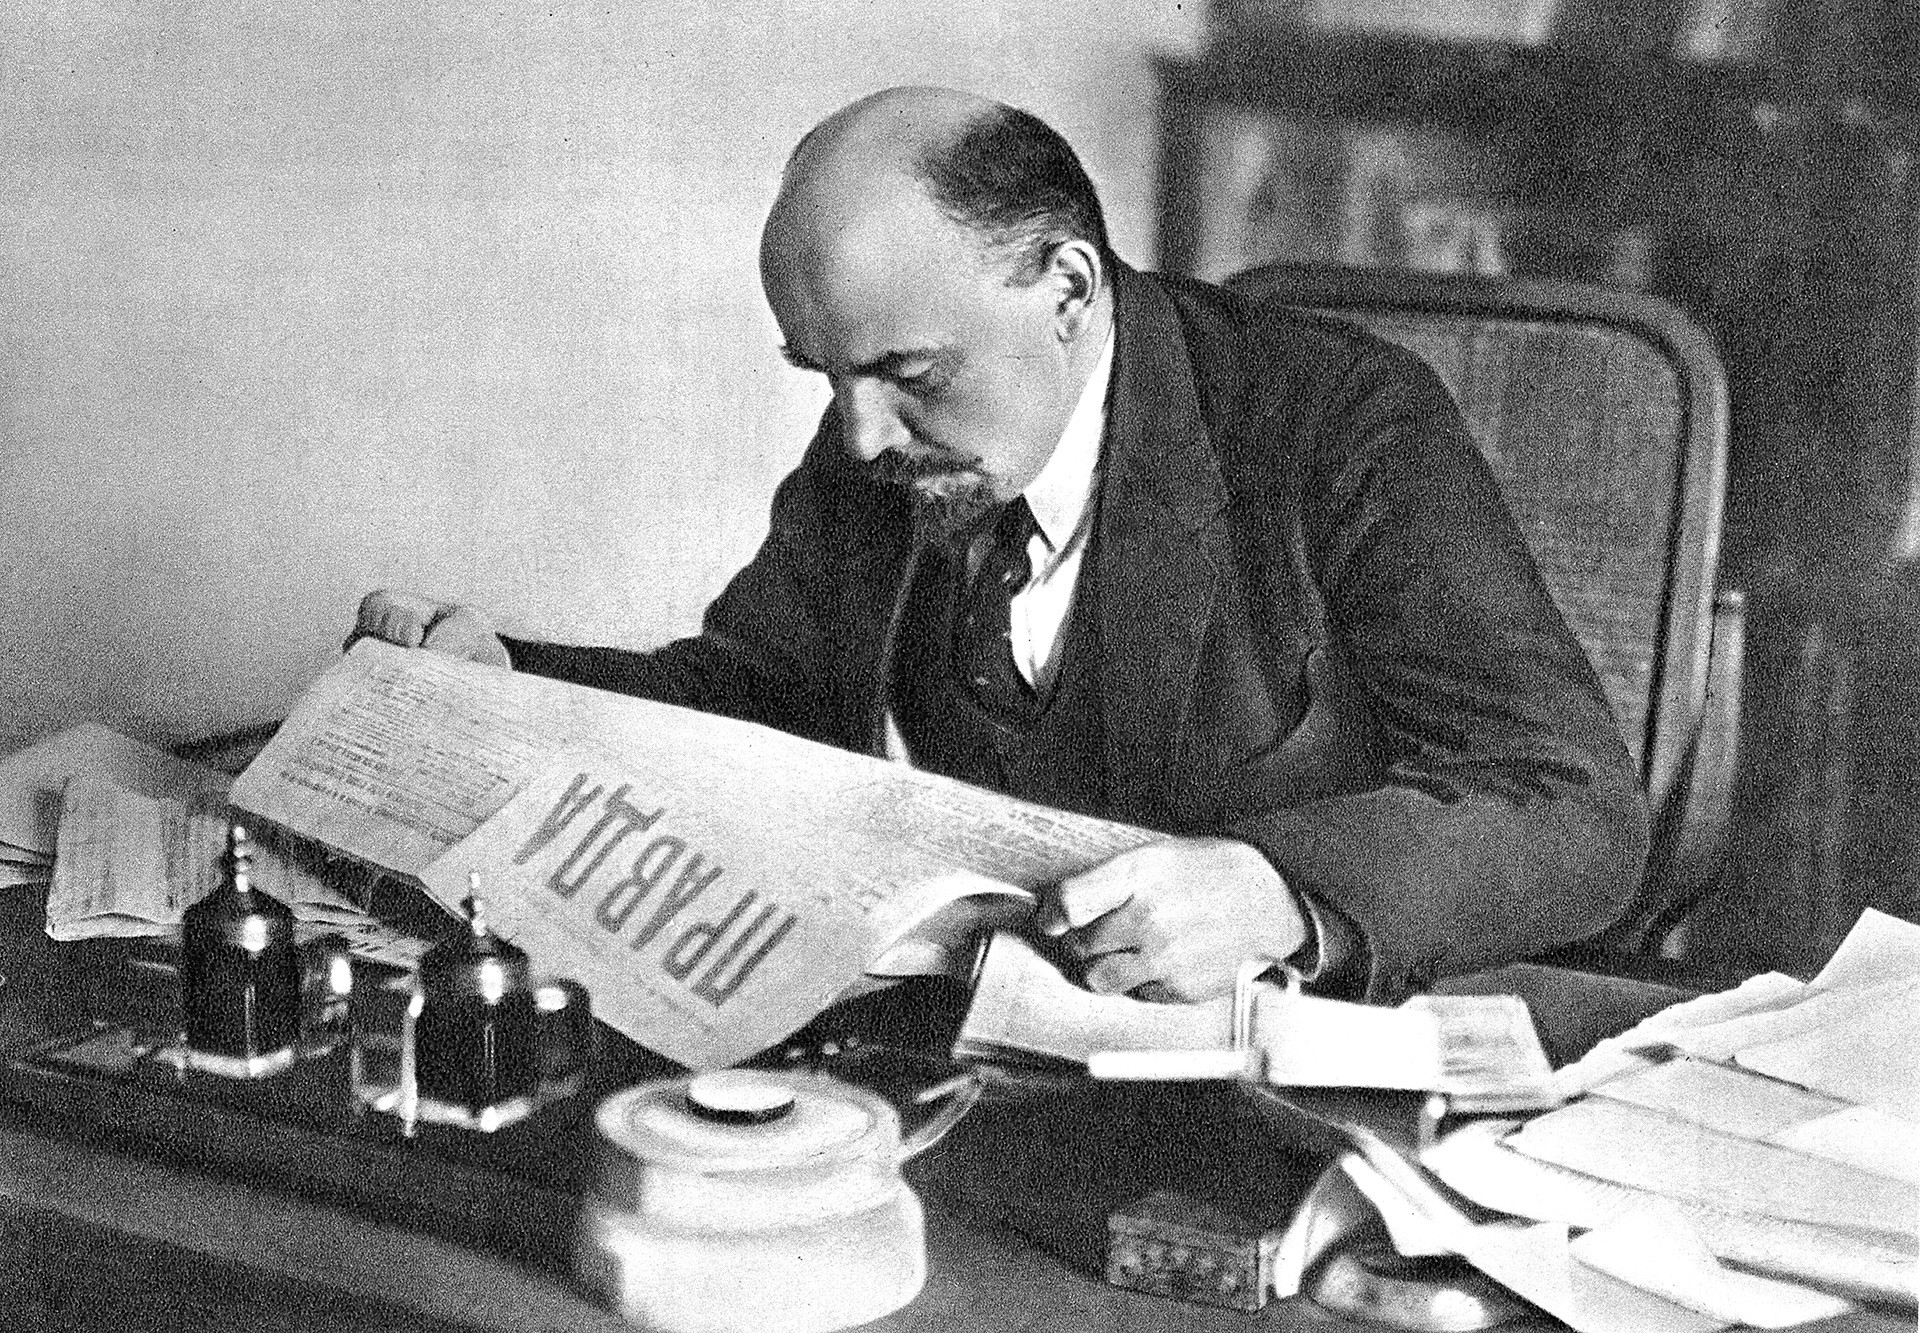 Lenin lee el diario 'Pravda'.